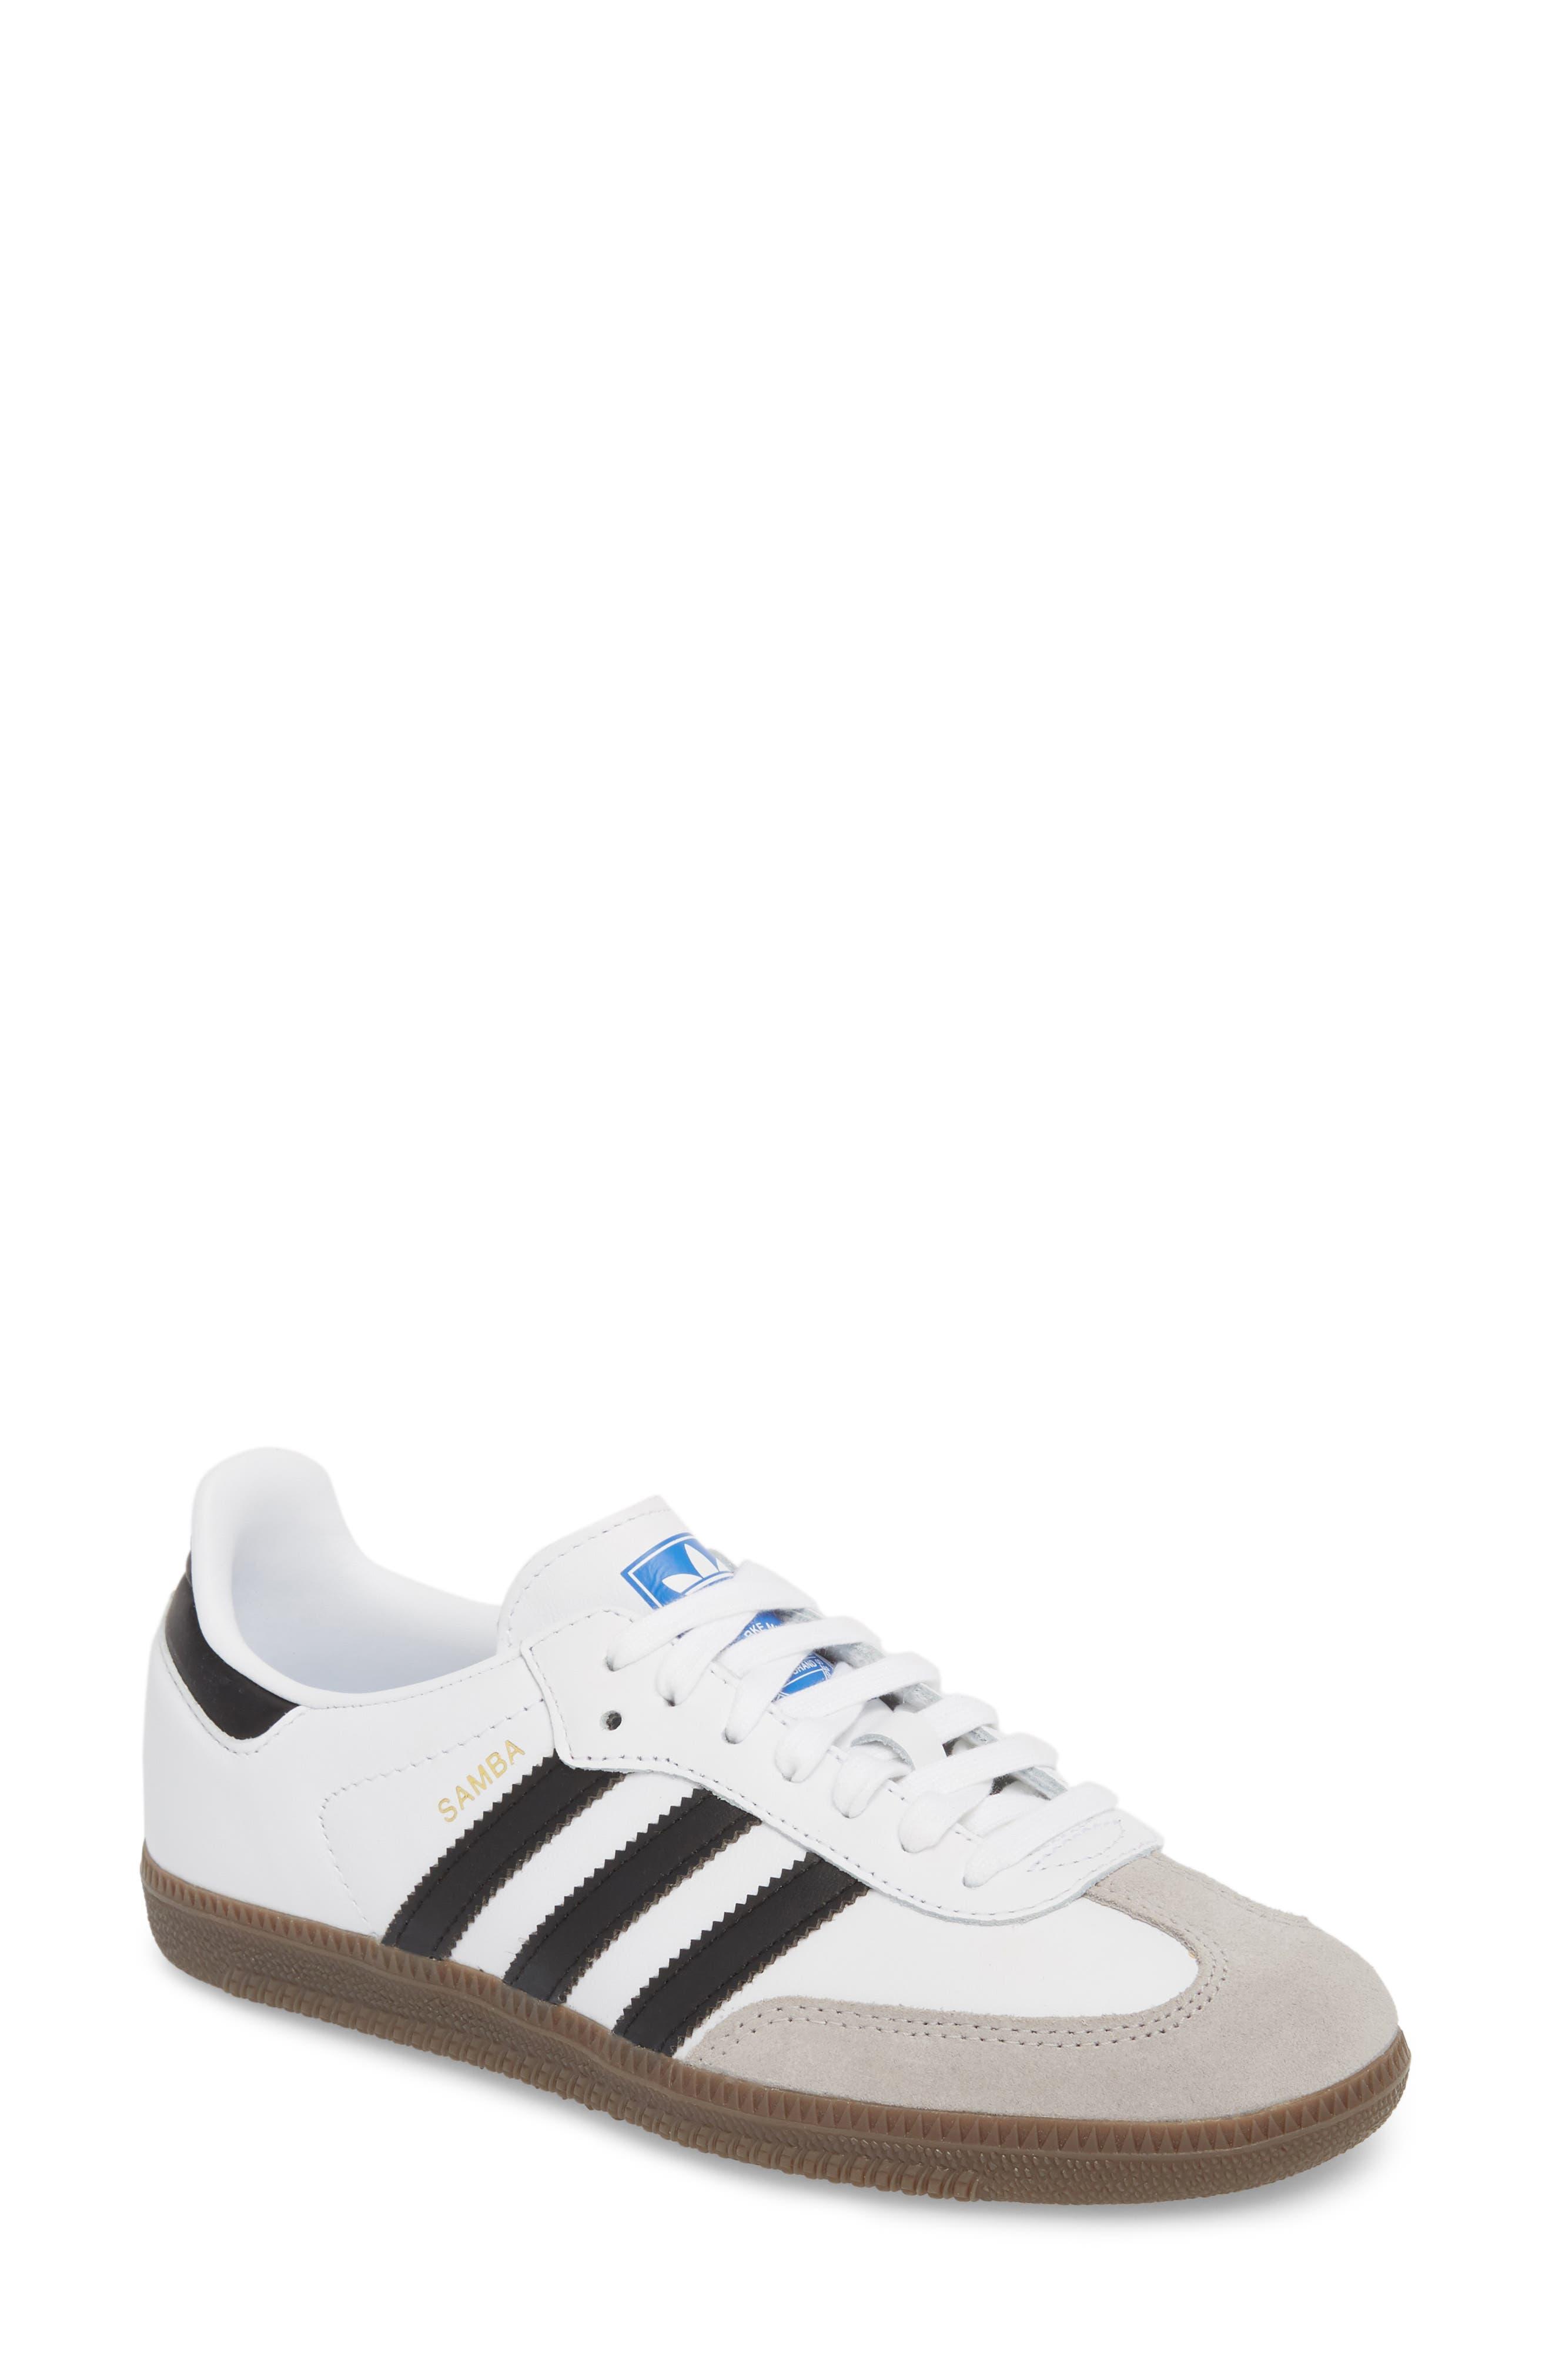 'Samba' Sneaker,                         Main,                         color, White/ Black/ Clear Granite